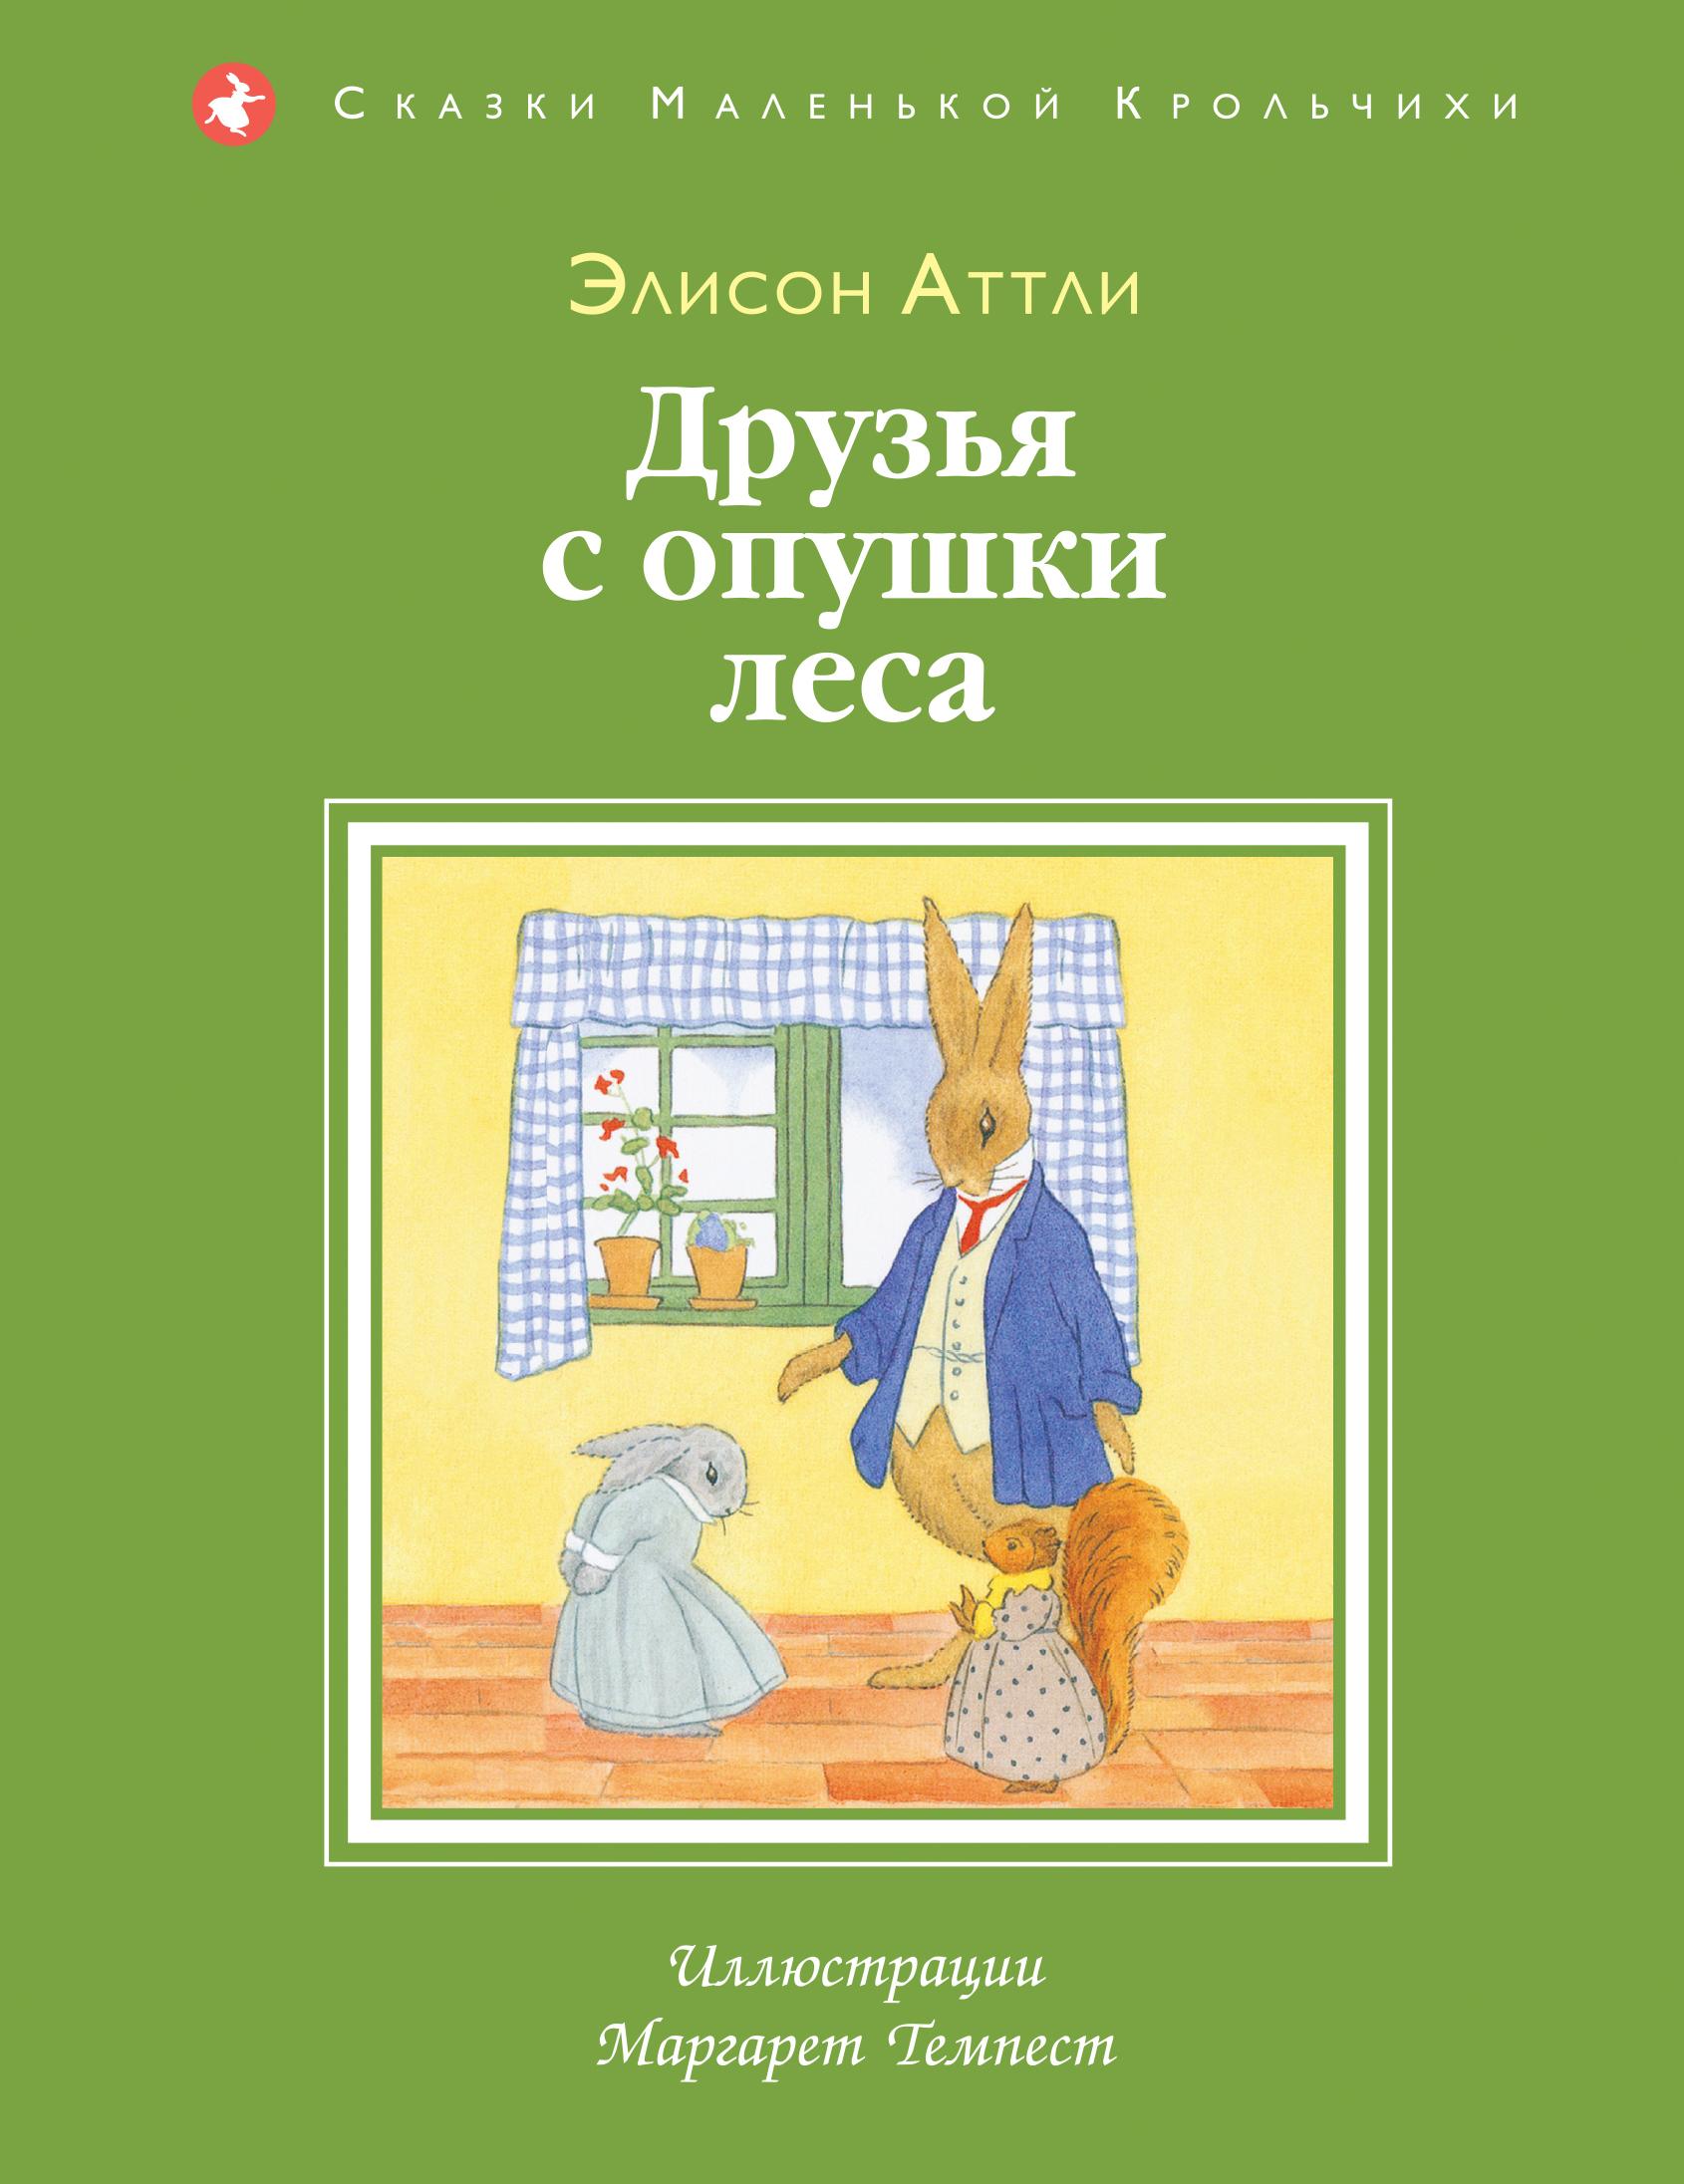 Аттли Э. Друзья с опушки леса (ил. М. Темпест) ISBN: 978-5-699-73707-9